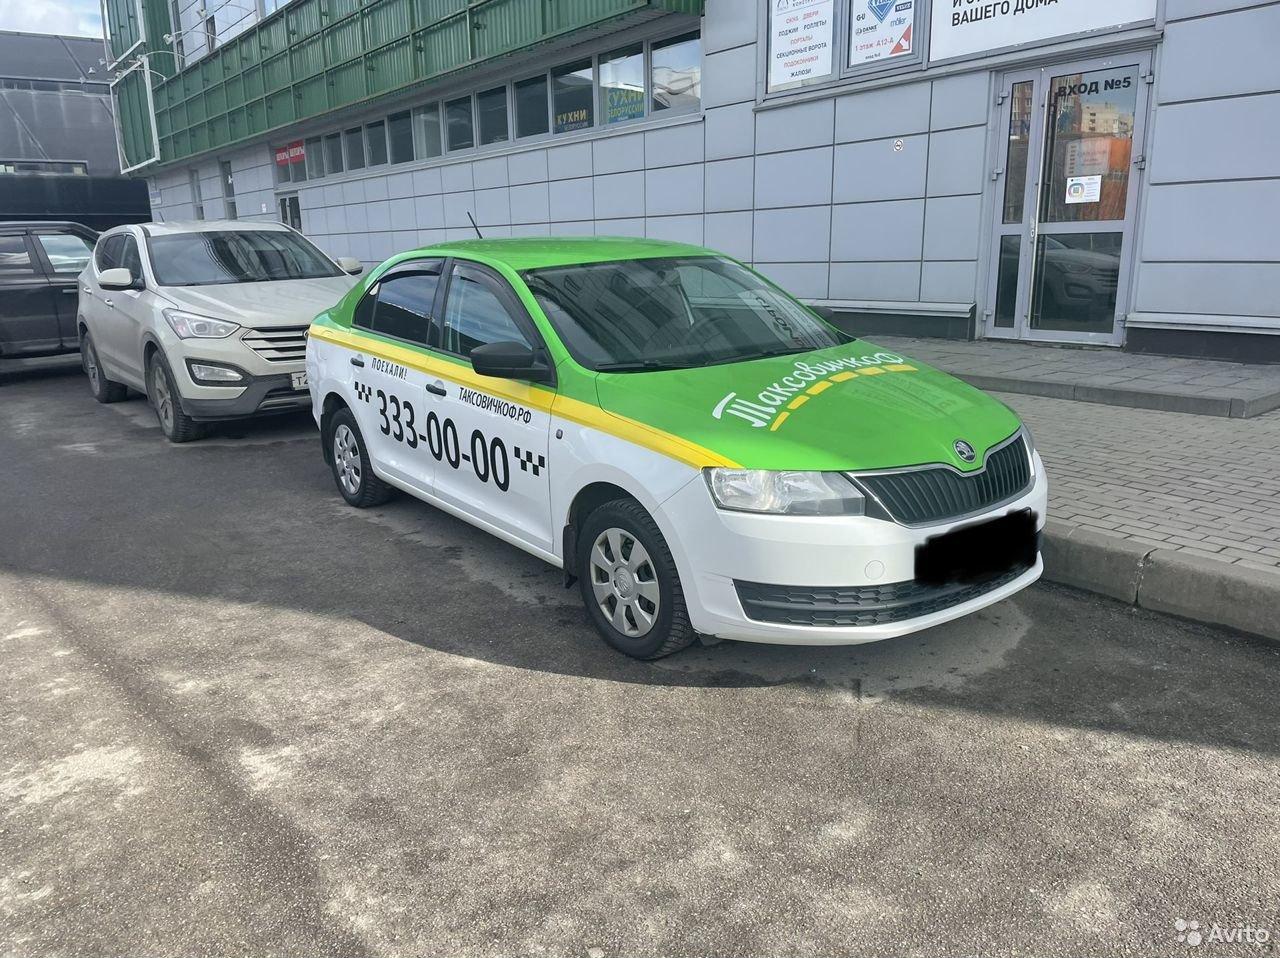 Работа в такси на парковом автомобиле